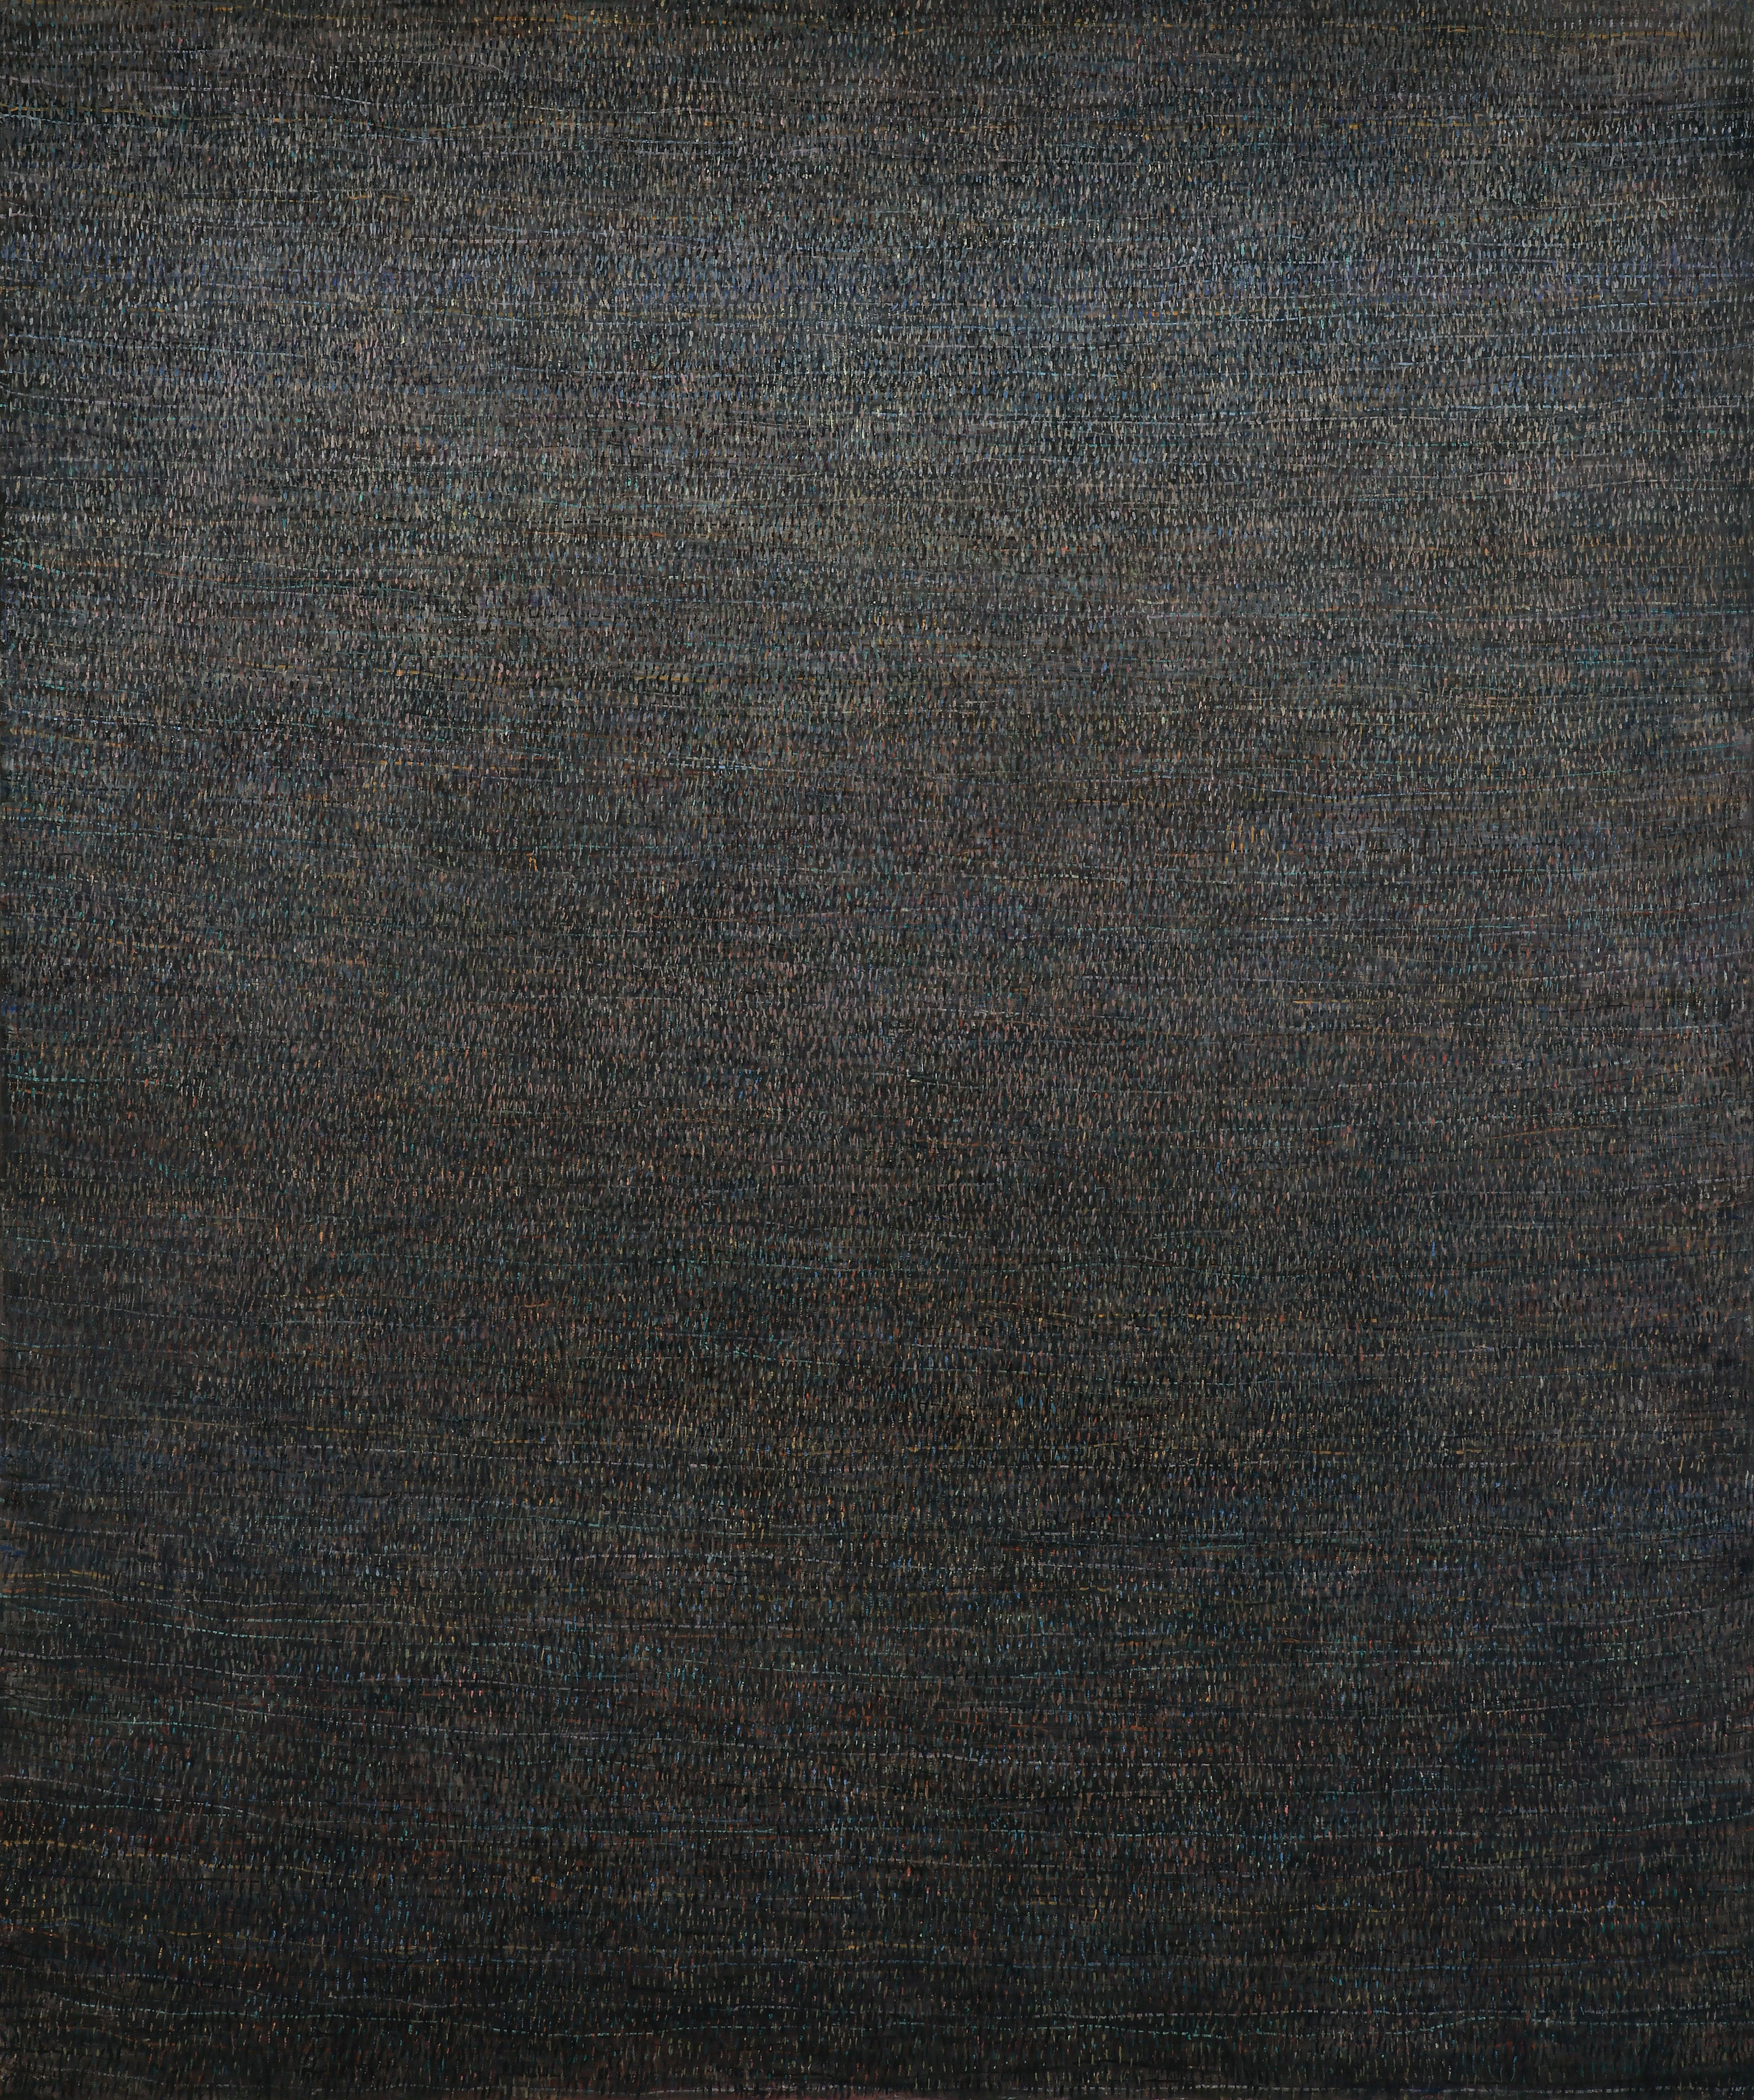 Good Evening - Large Format Painting, Modern, Minimalistic, Contemplative